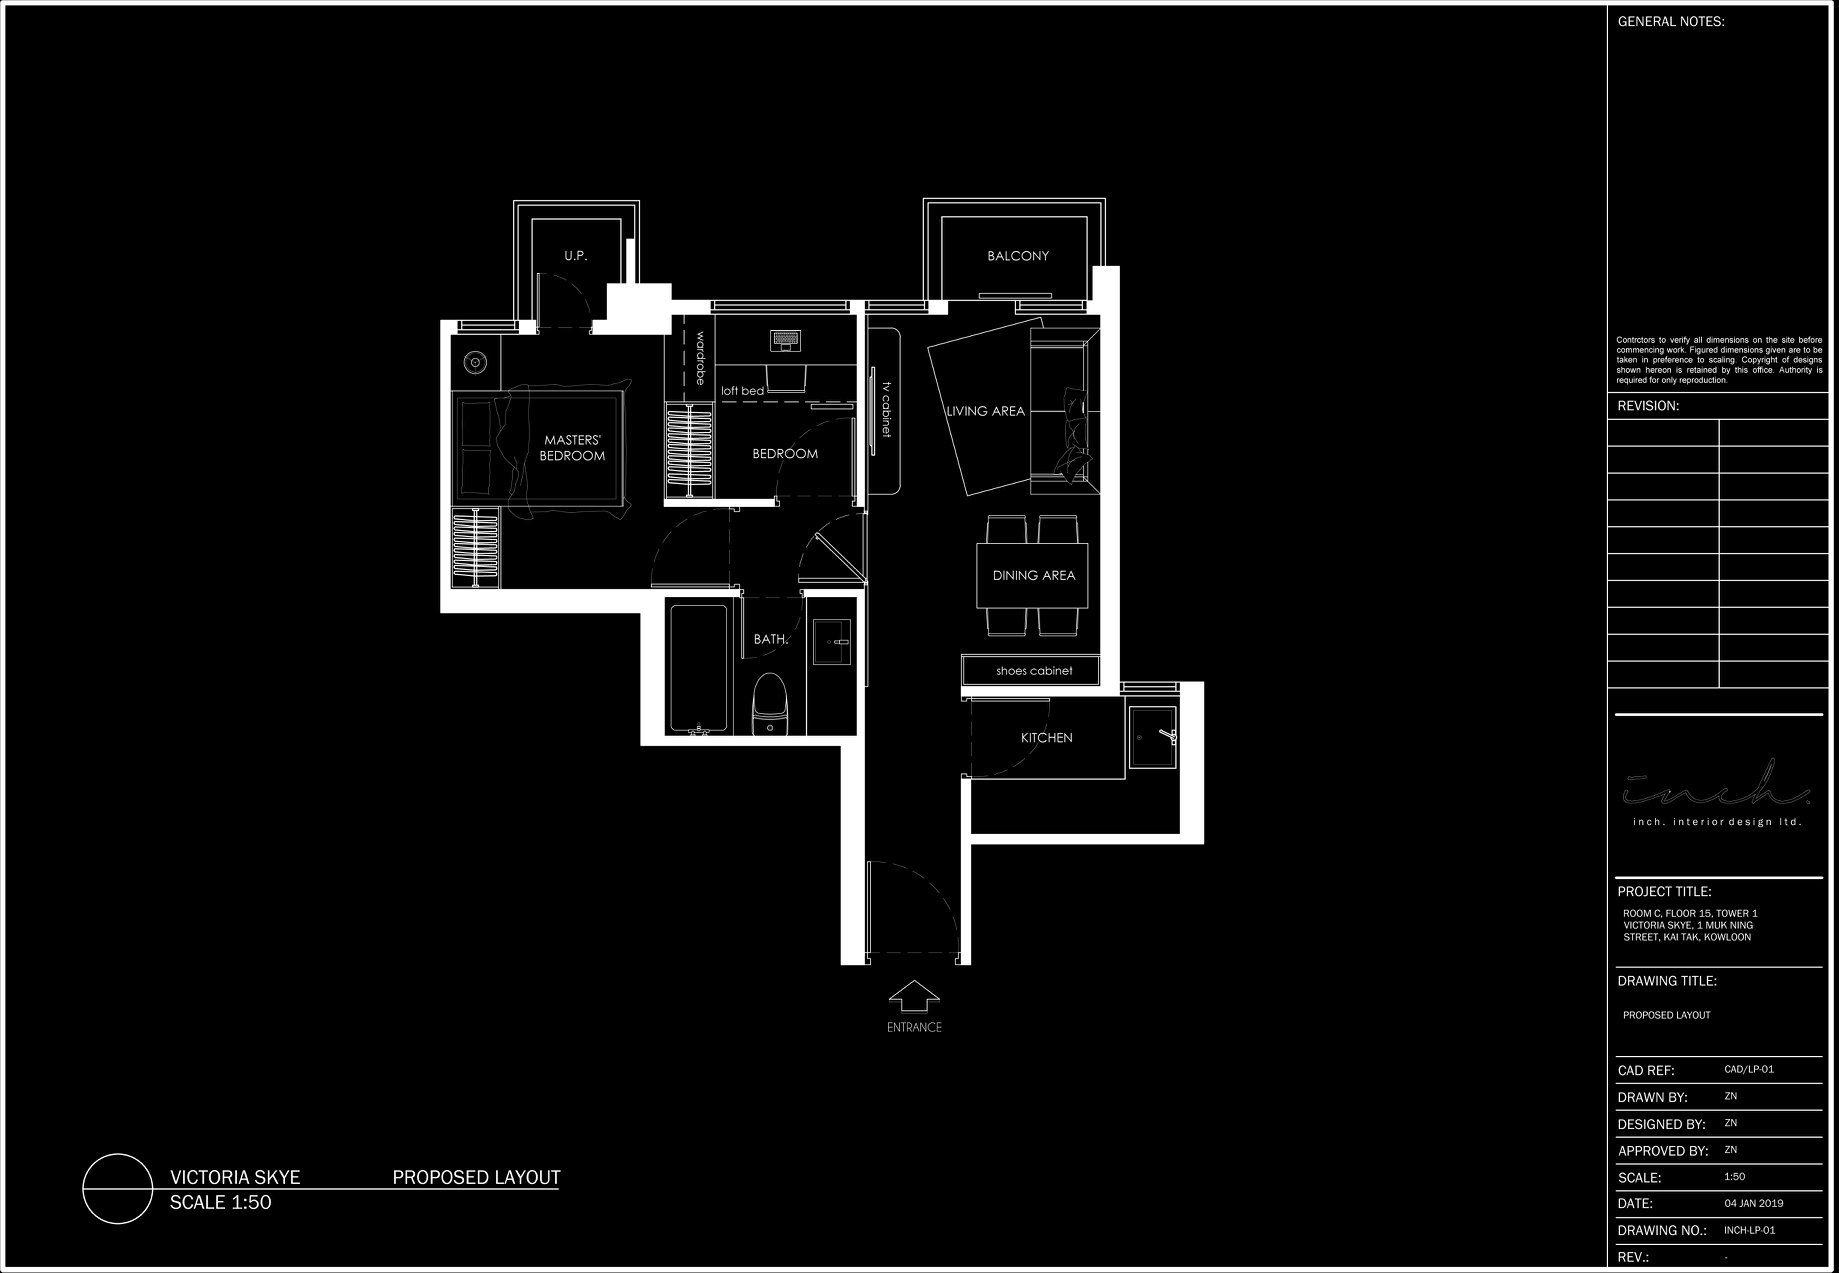 Inch Interior Design Victoria Skye Concept Floorplan